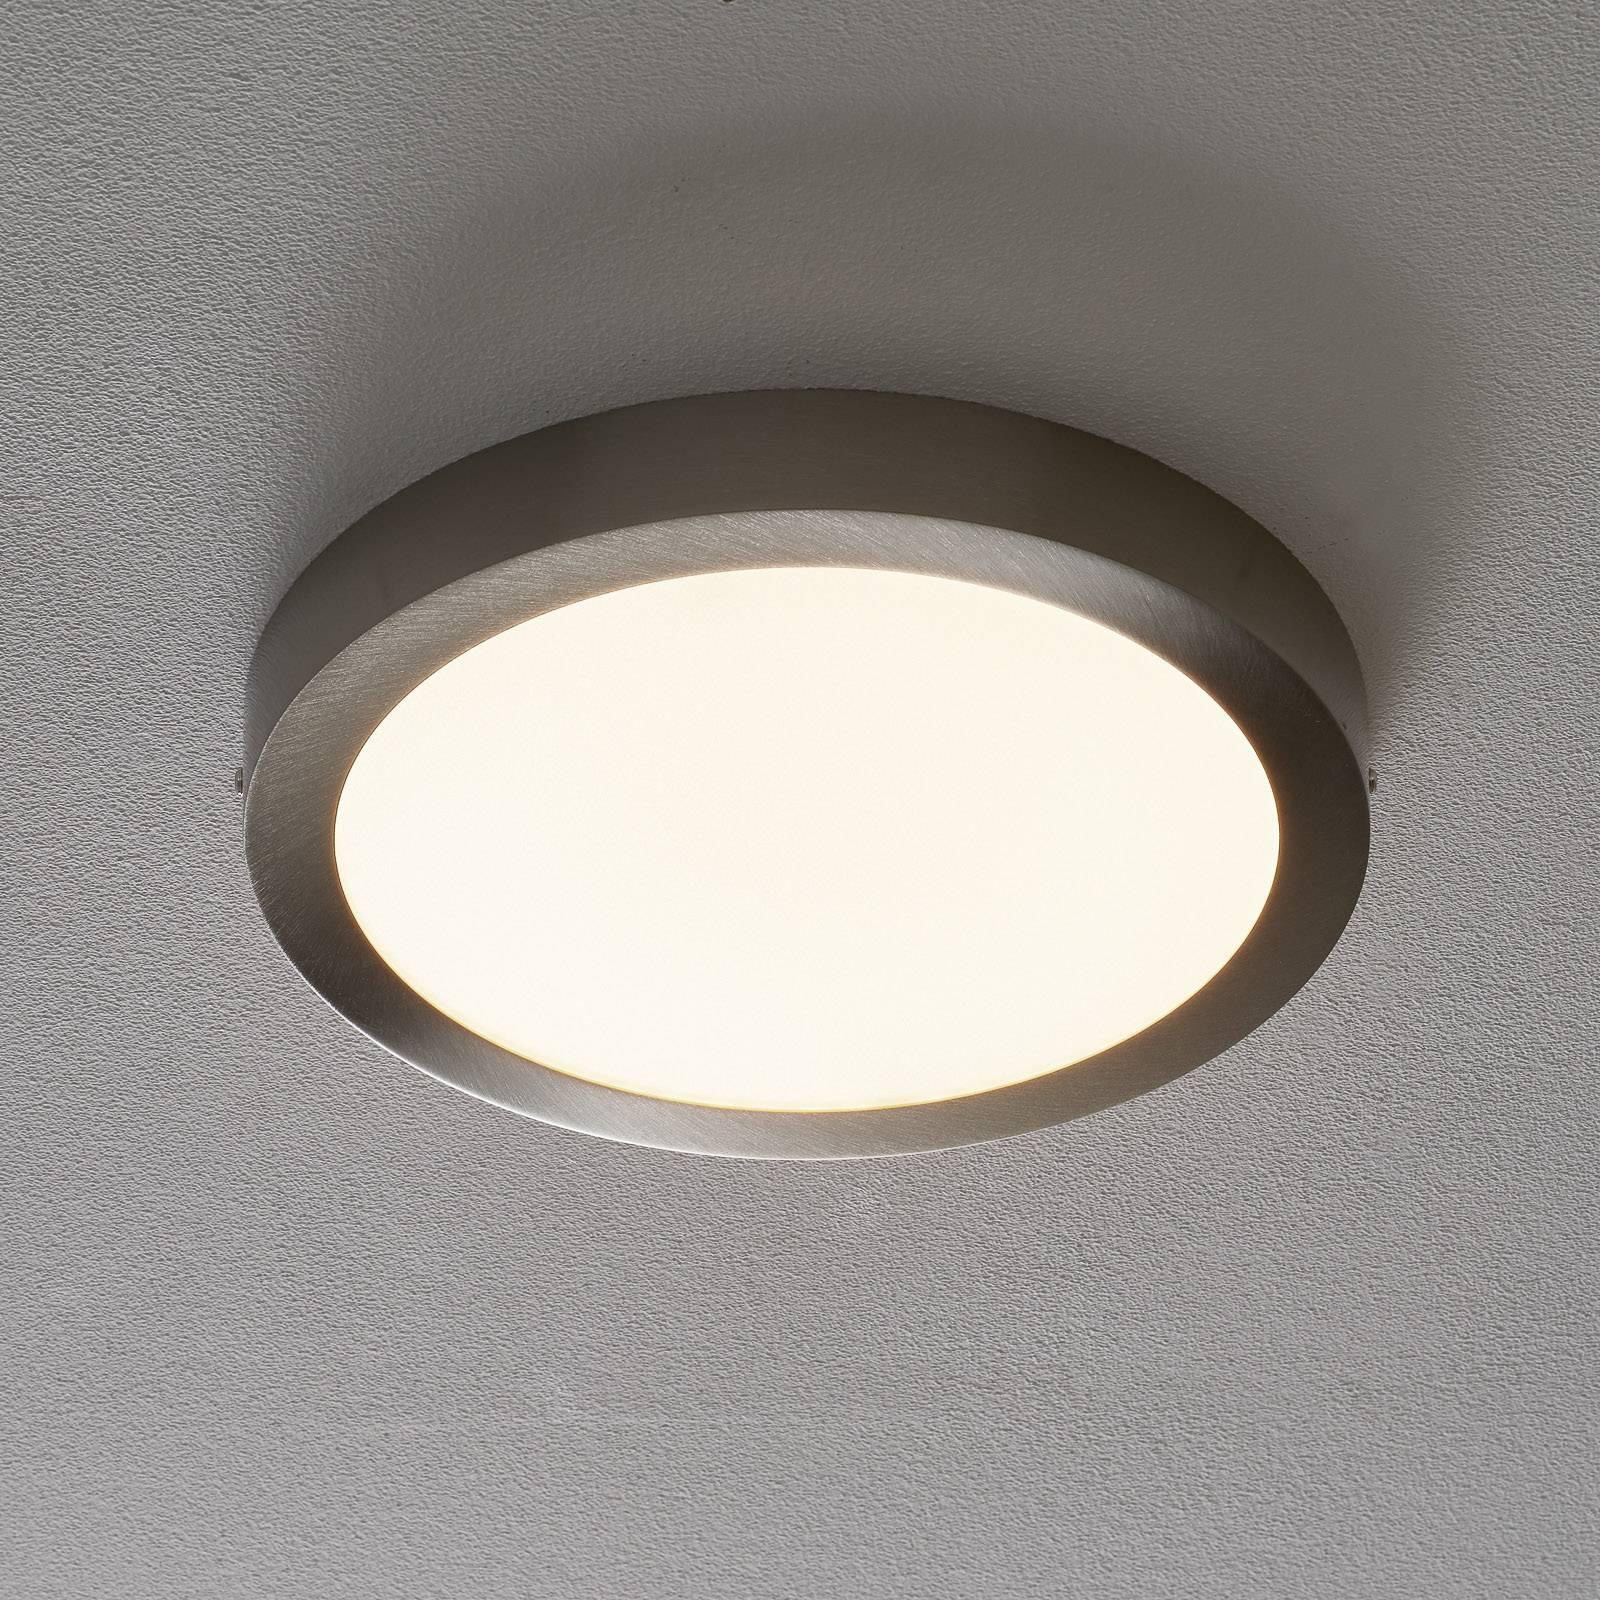 Fueva Connect - LED-kattovalaisin, 30 cm, nikkeli